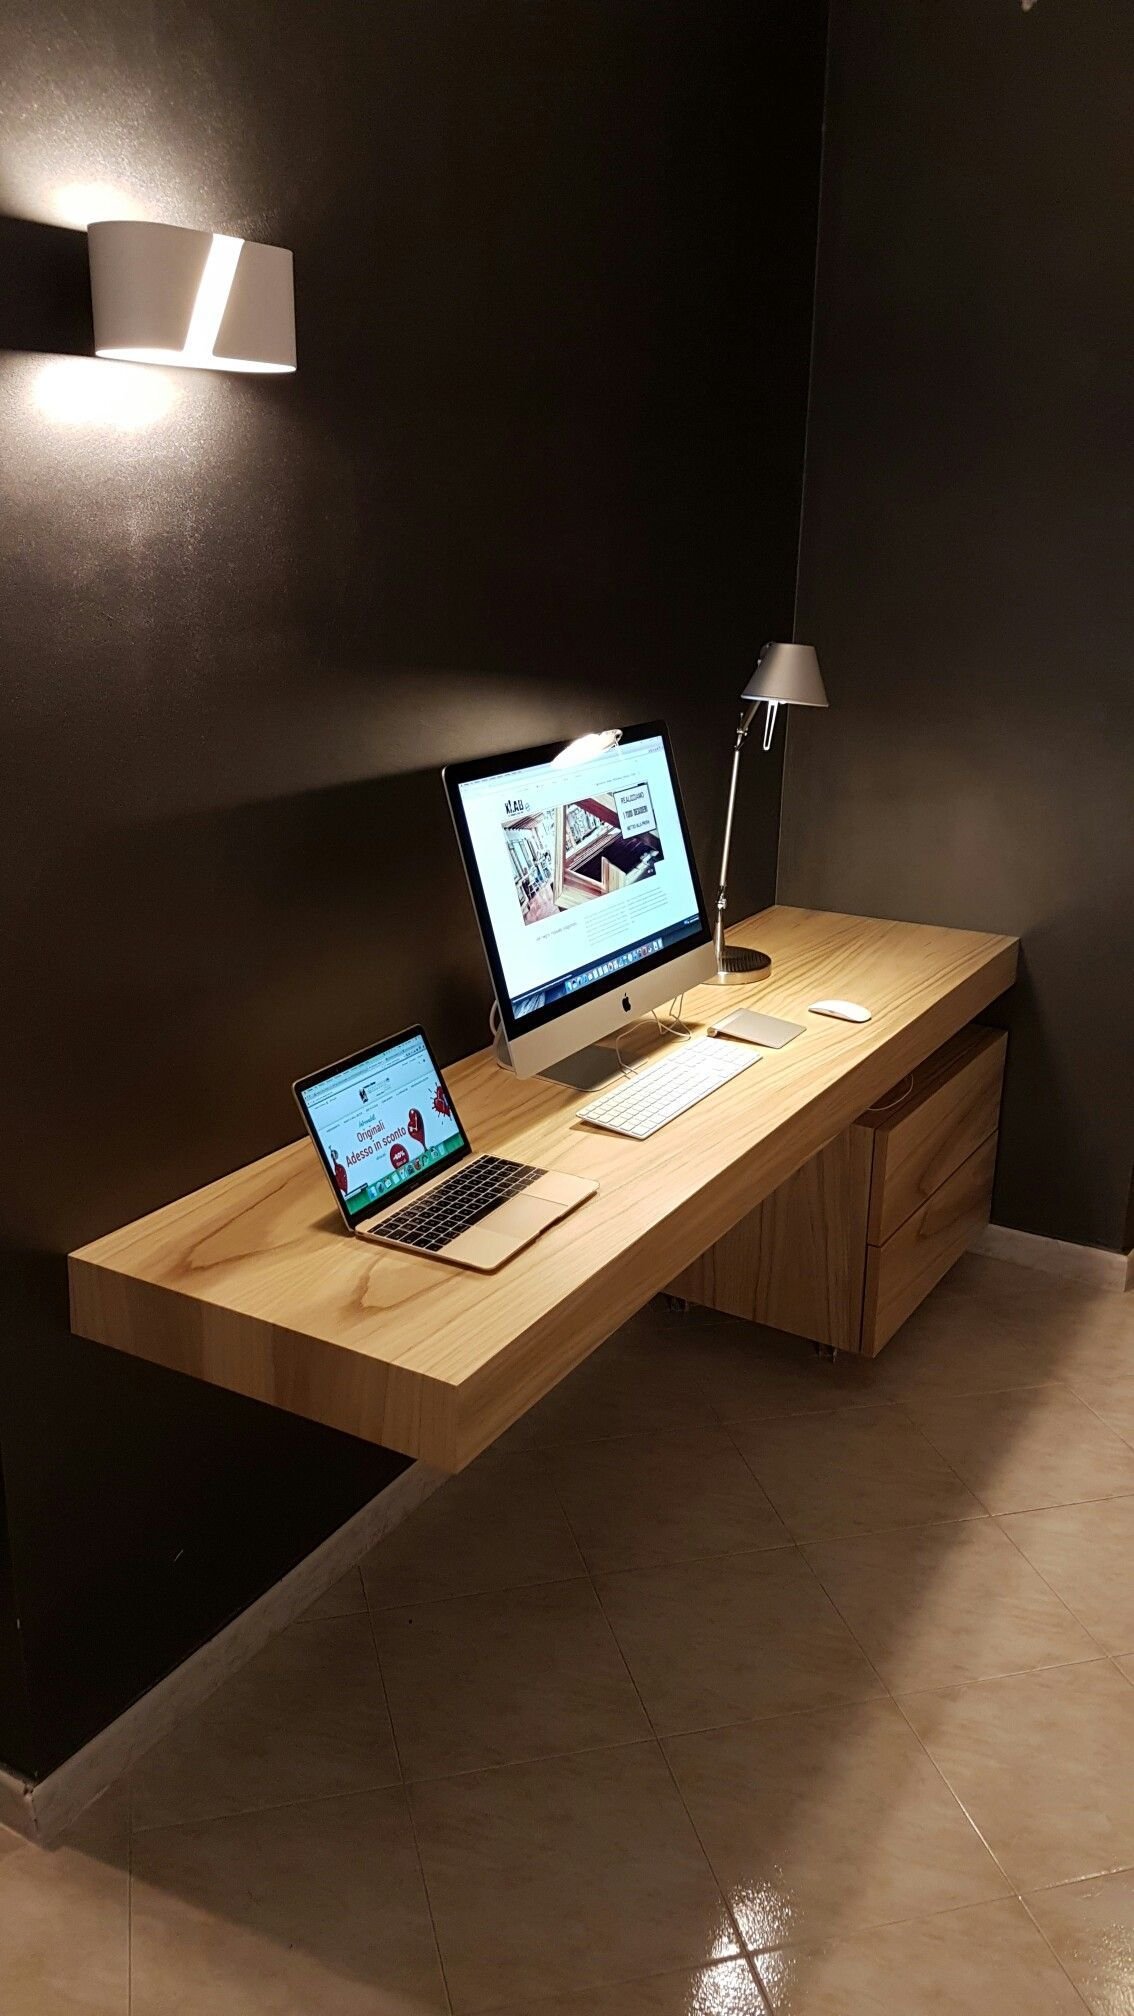 10 Outstanding Computer Desk Ideas Space Saving Gorgeous Picture Office Desk Designs Diy Office Desk Computer Desk Design